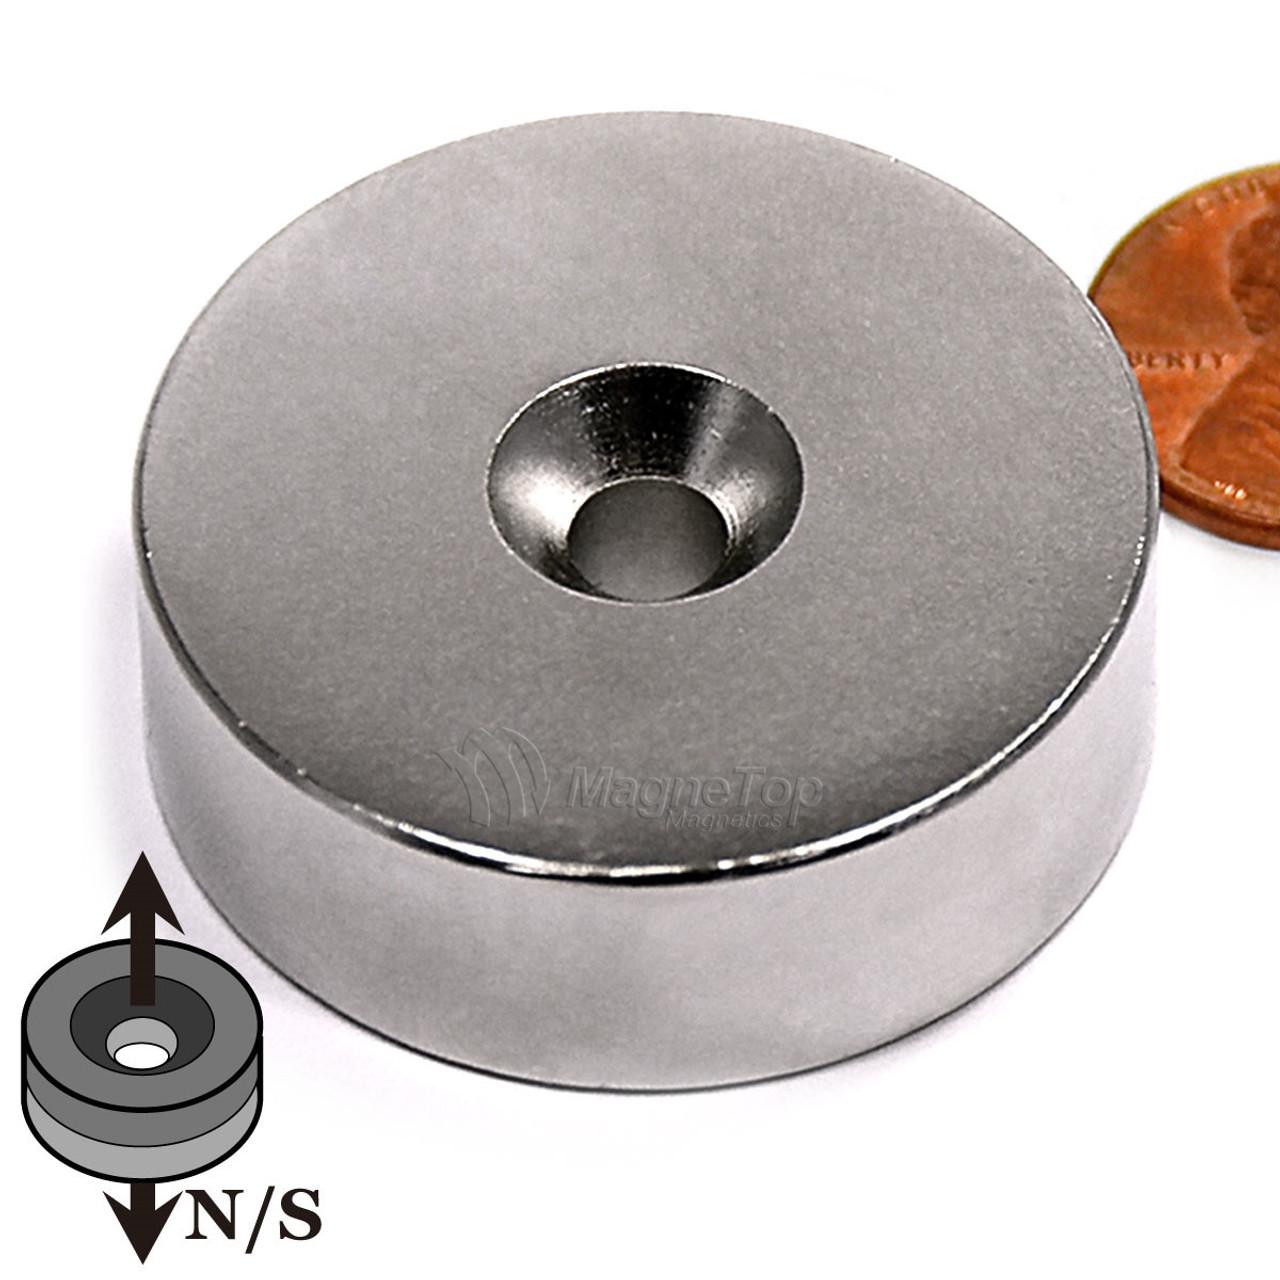 38.1mm x 12.7mm-N42-M6 Countersink on Both Side   Neodymium Round Countersunk